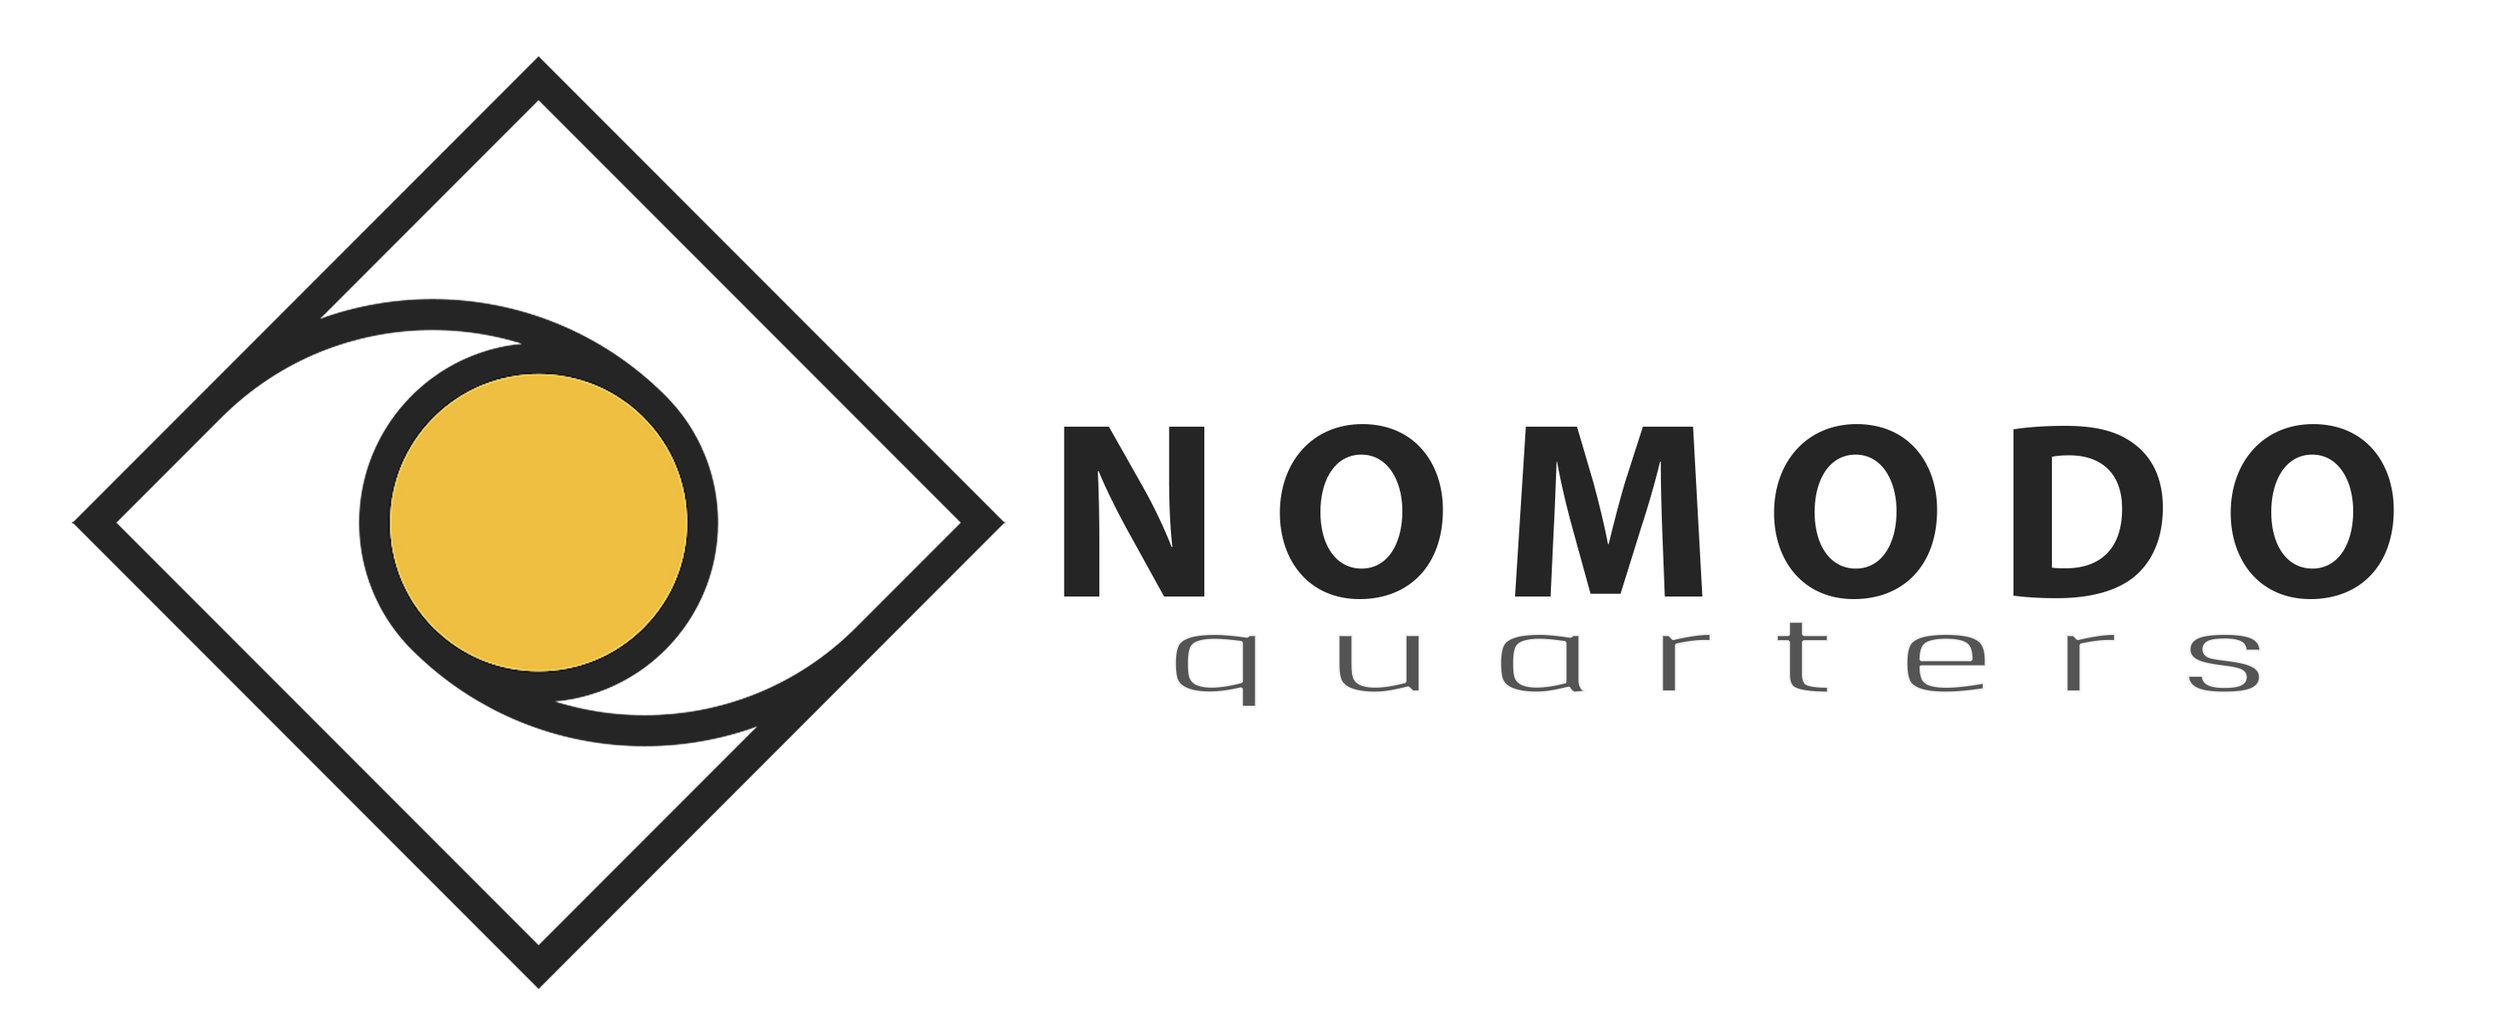 NOMODO banner size.jpg